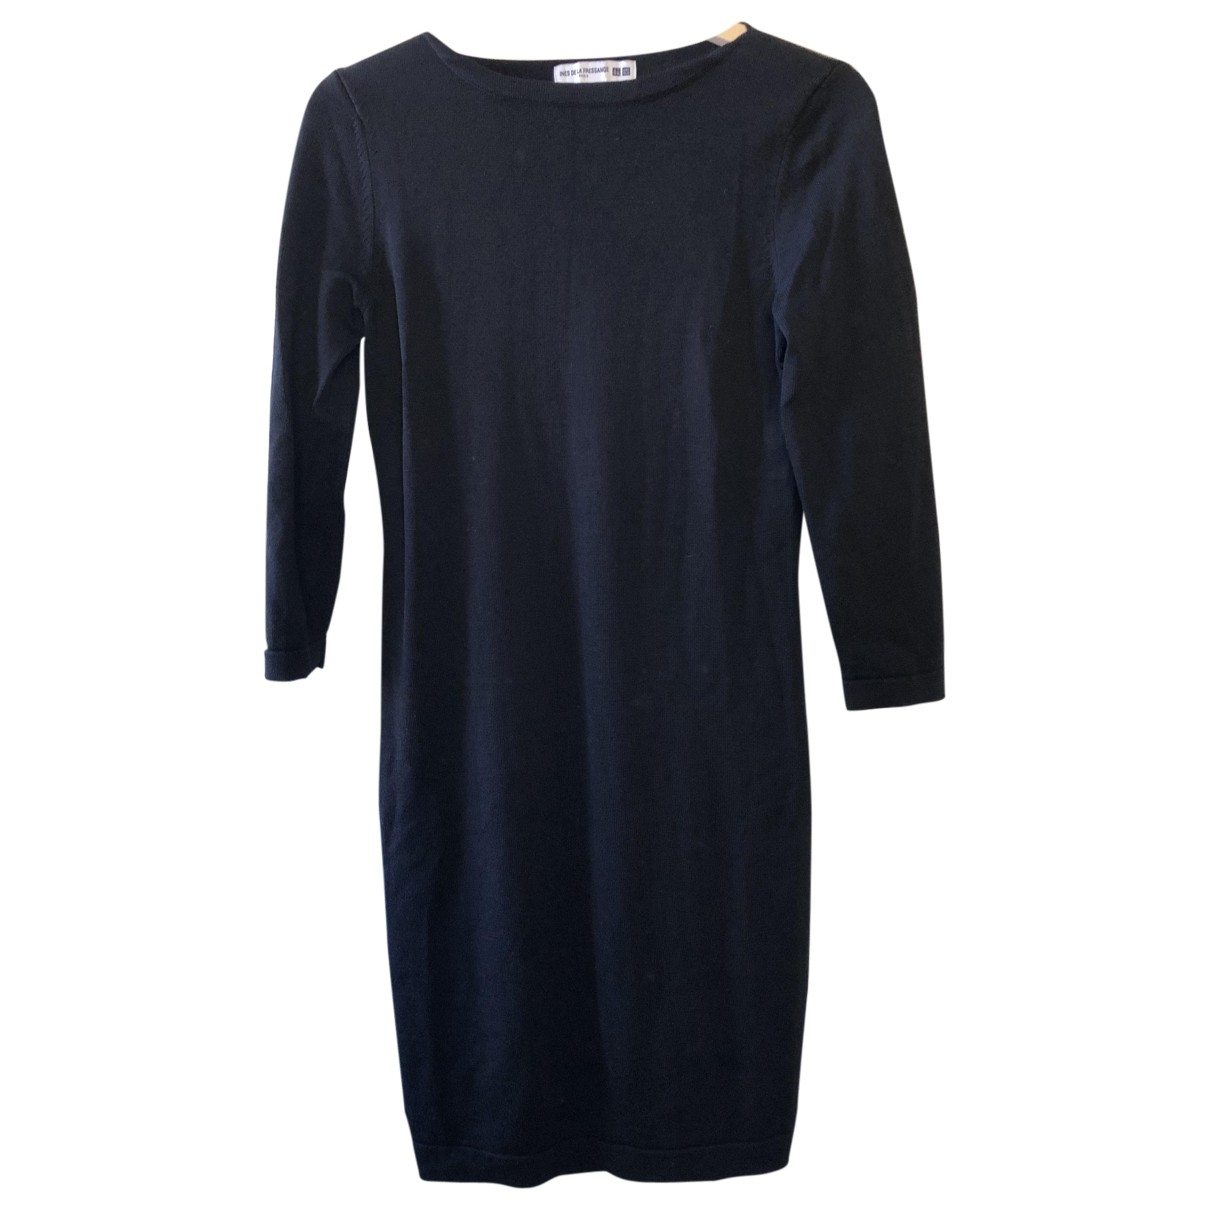 Uniqlo \N Kleid in  Schwarz Baumwolle - Elasthan